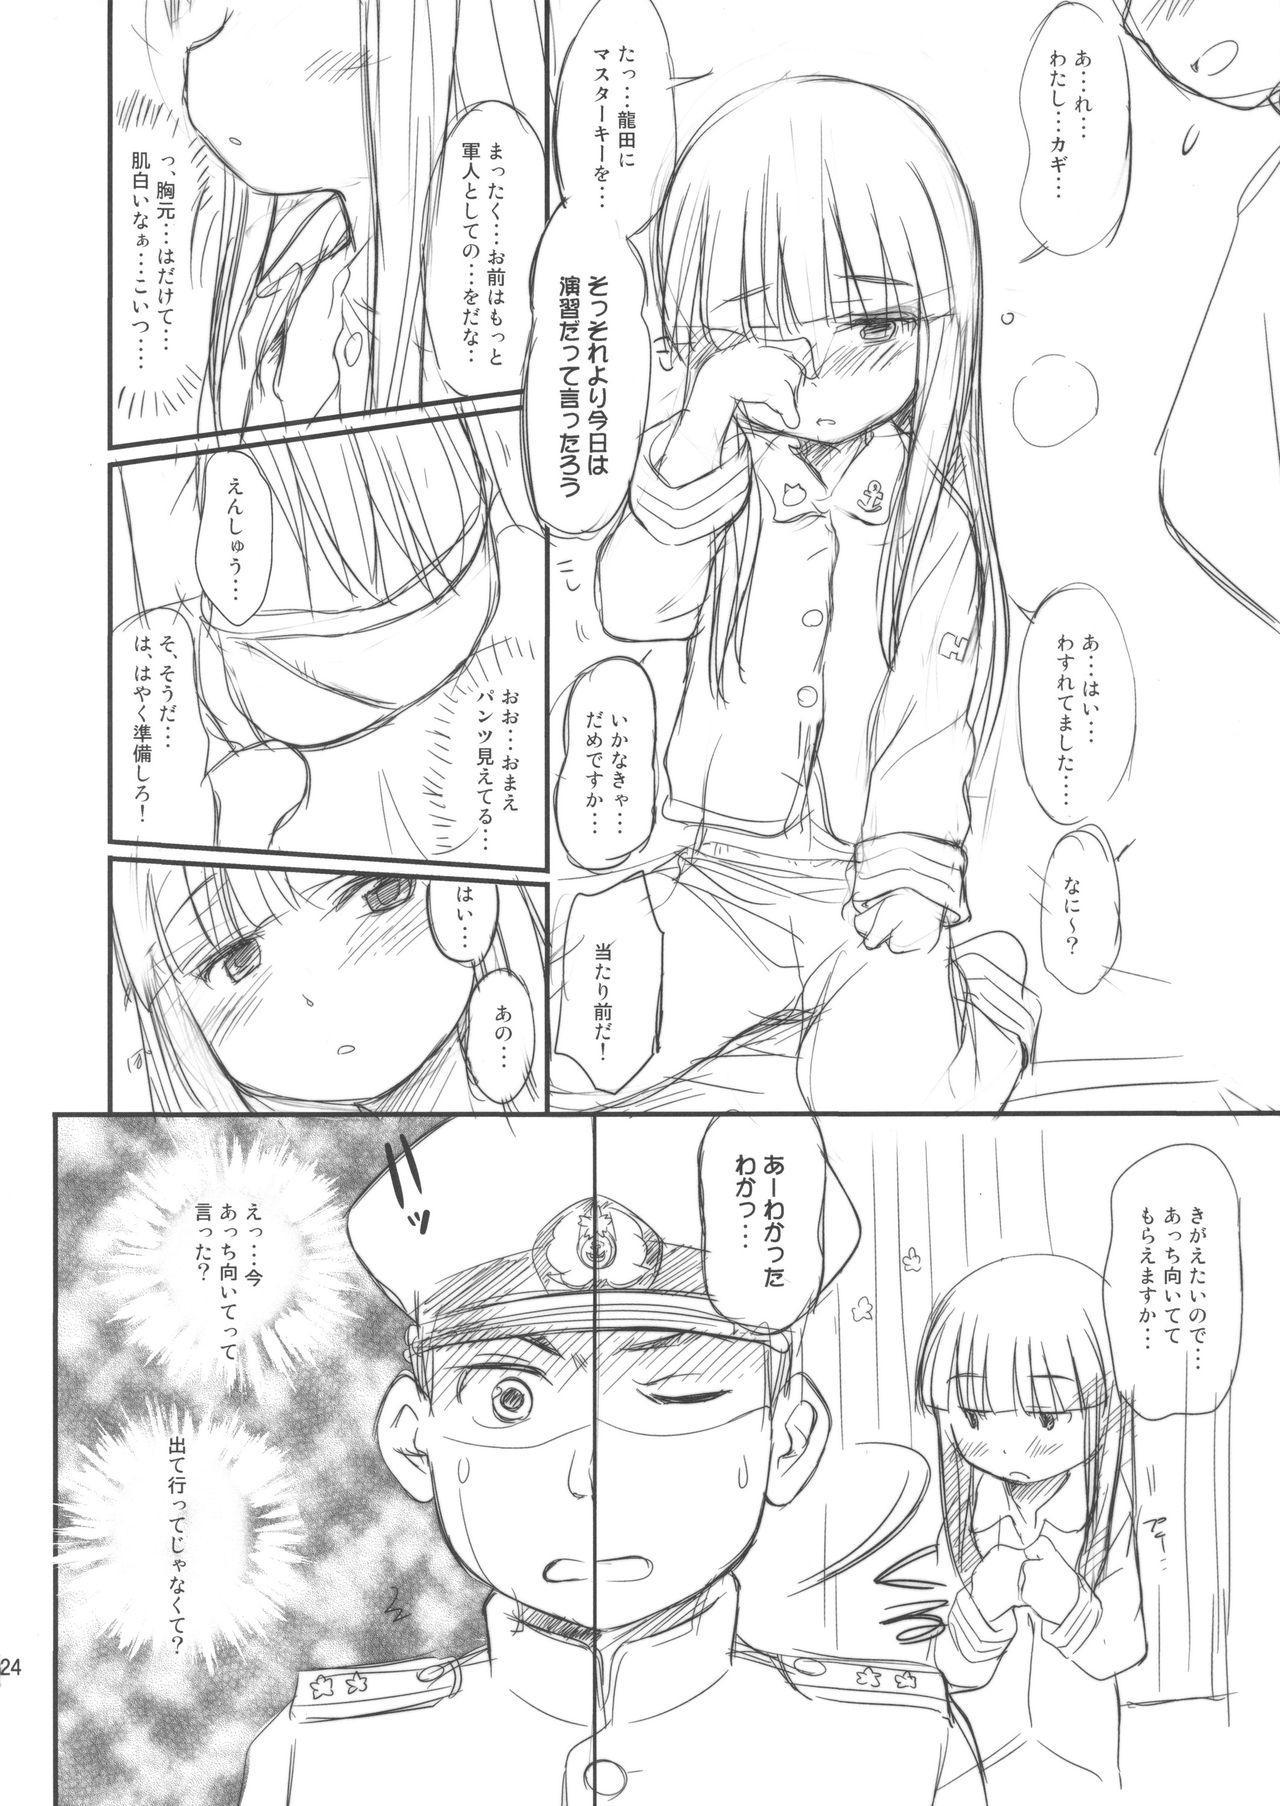 Kuchukukan Hachuyuki Monogatari 23